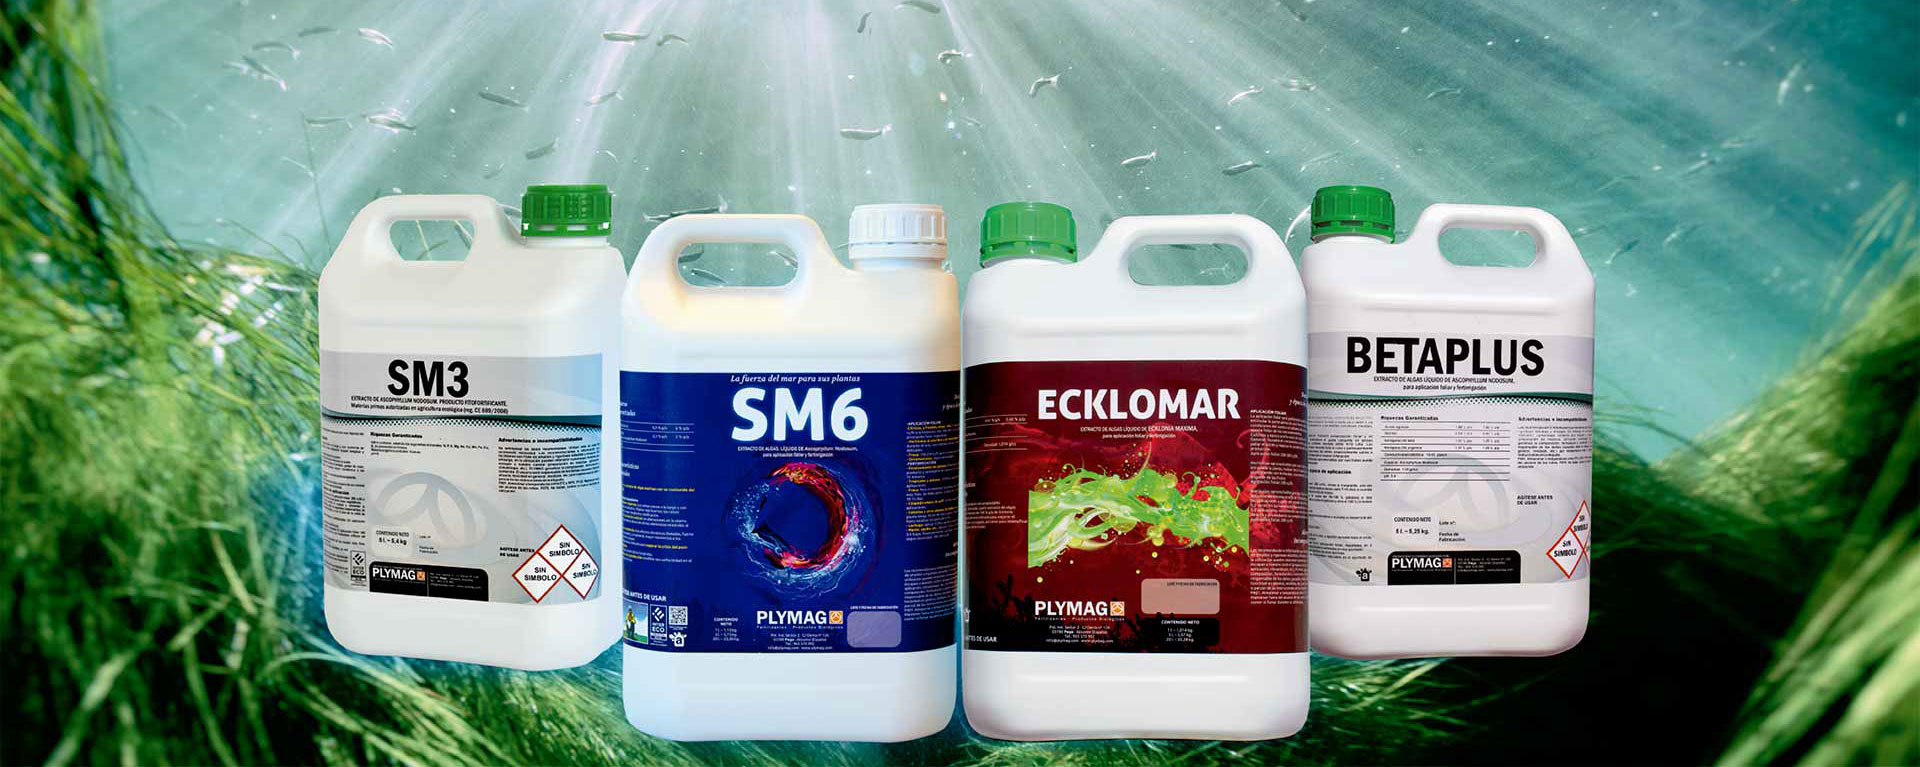 Bioestimulantes a base de algas